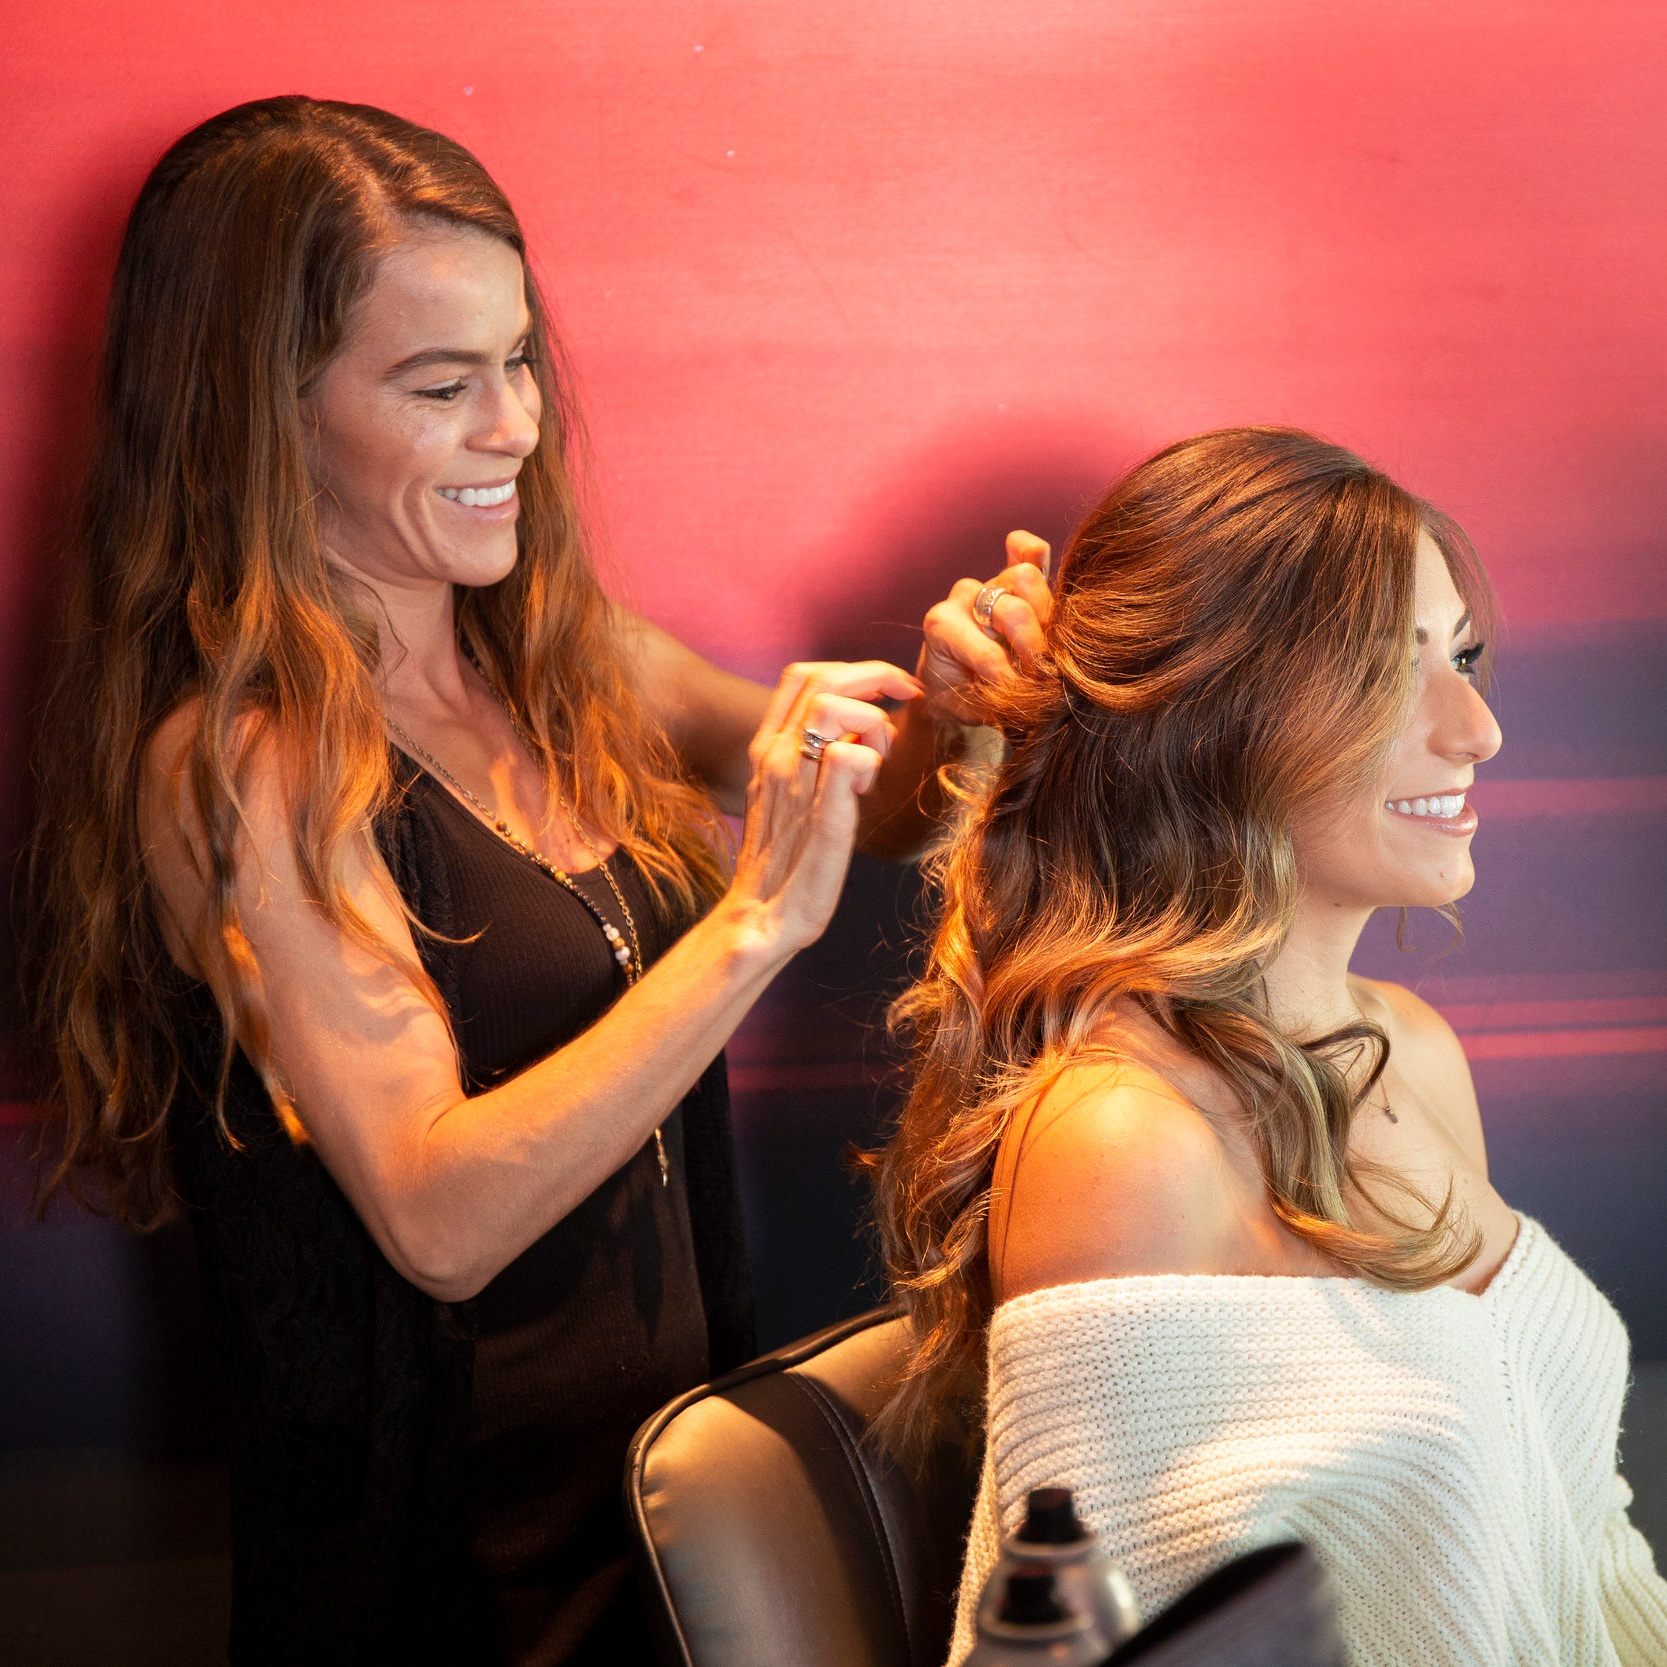 Professional_hair_Makeup_Las_Vegas_Photographer.jpg